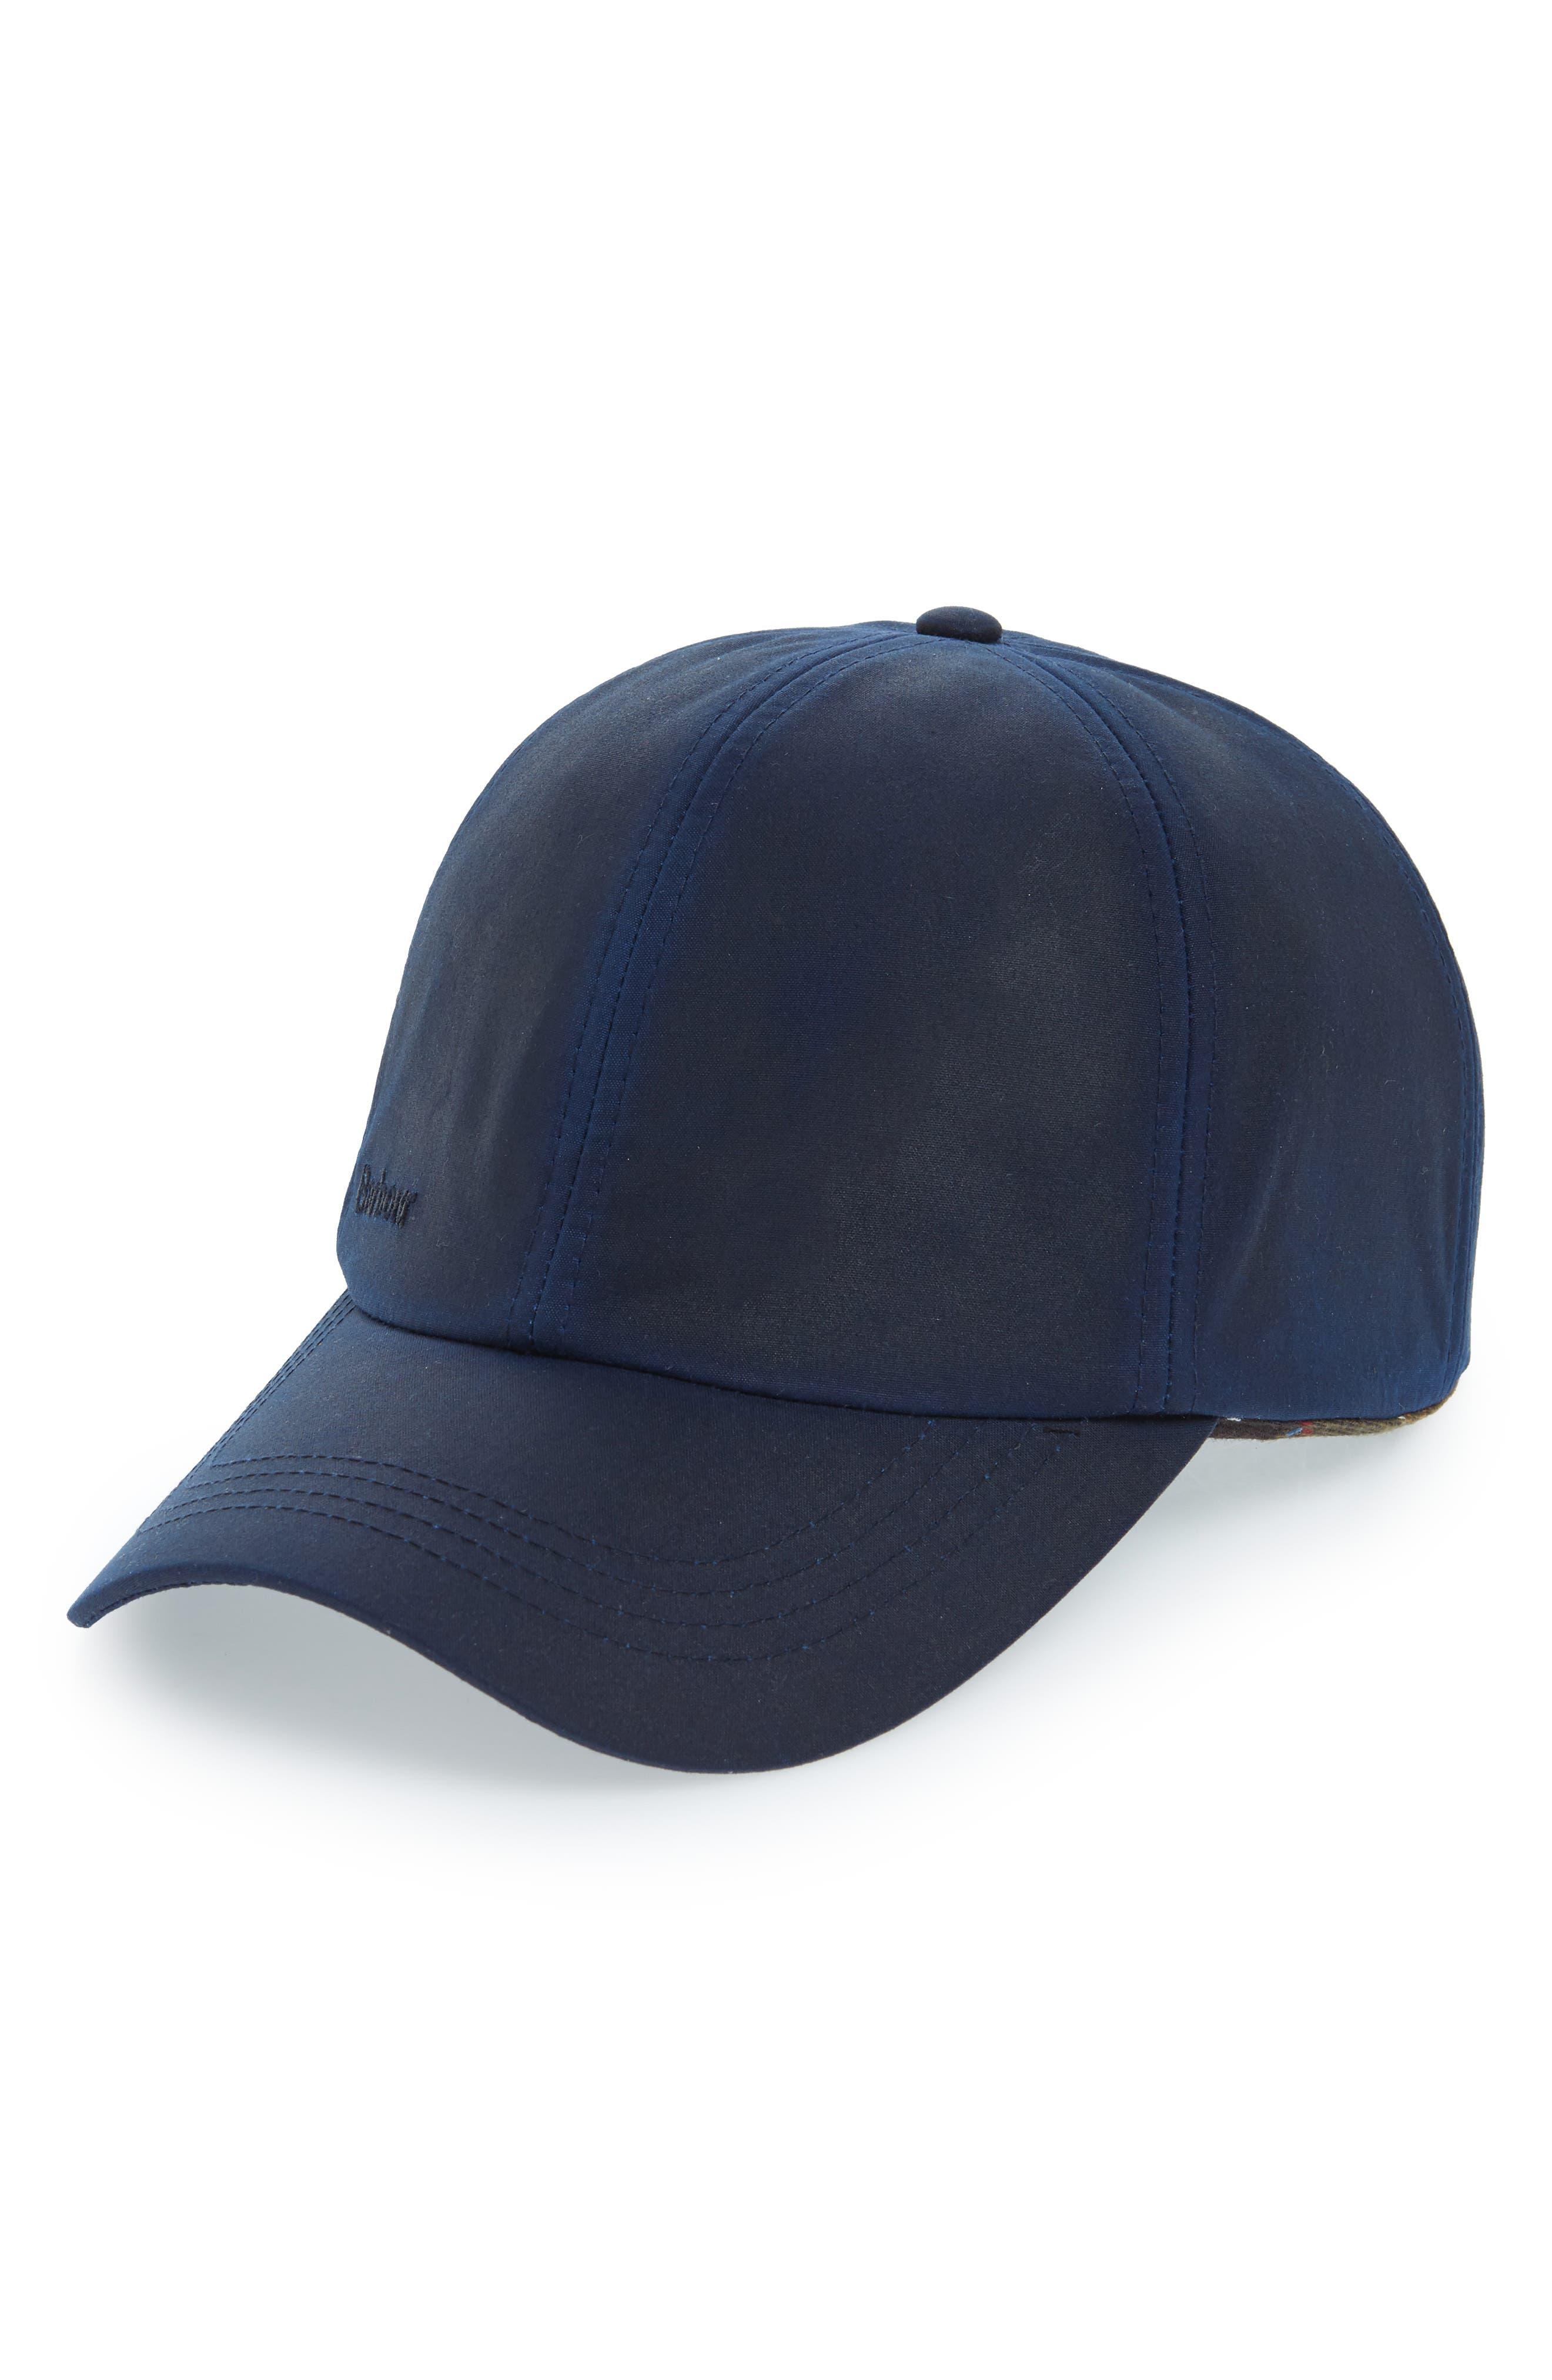 Main Image - Barbour Prestbury Baseball Cap